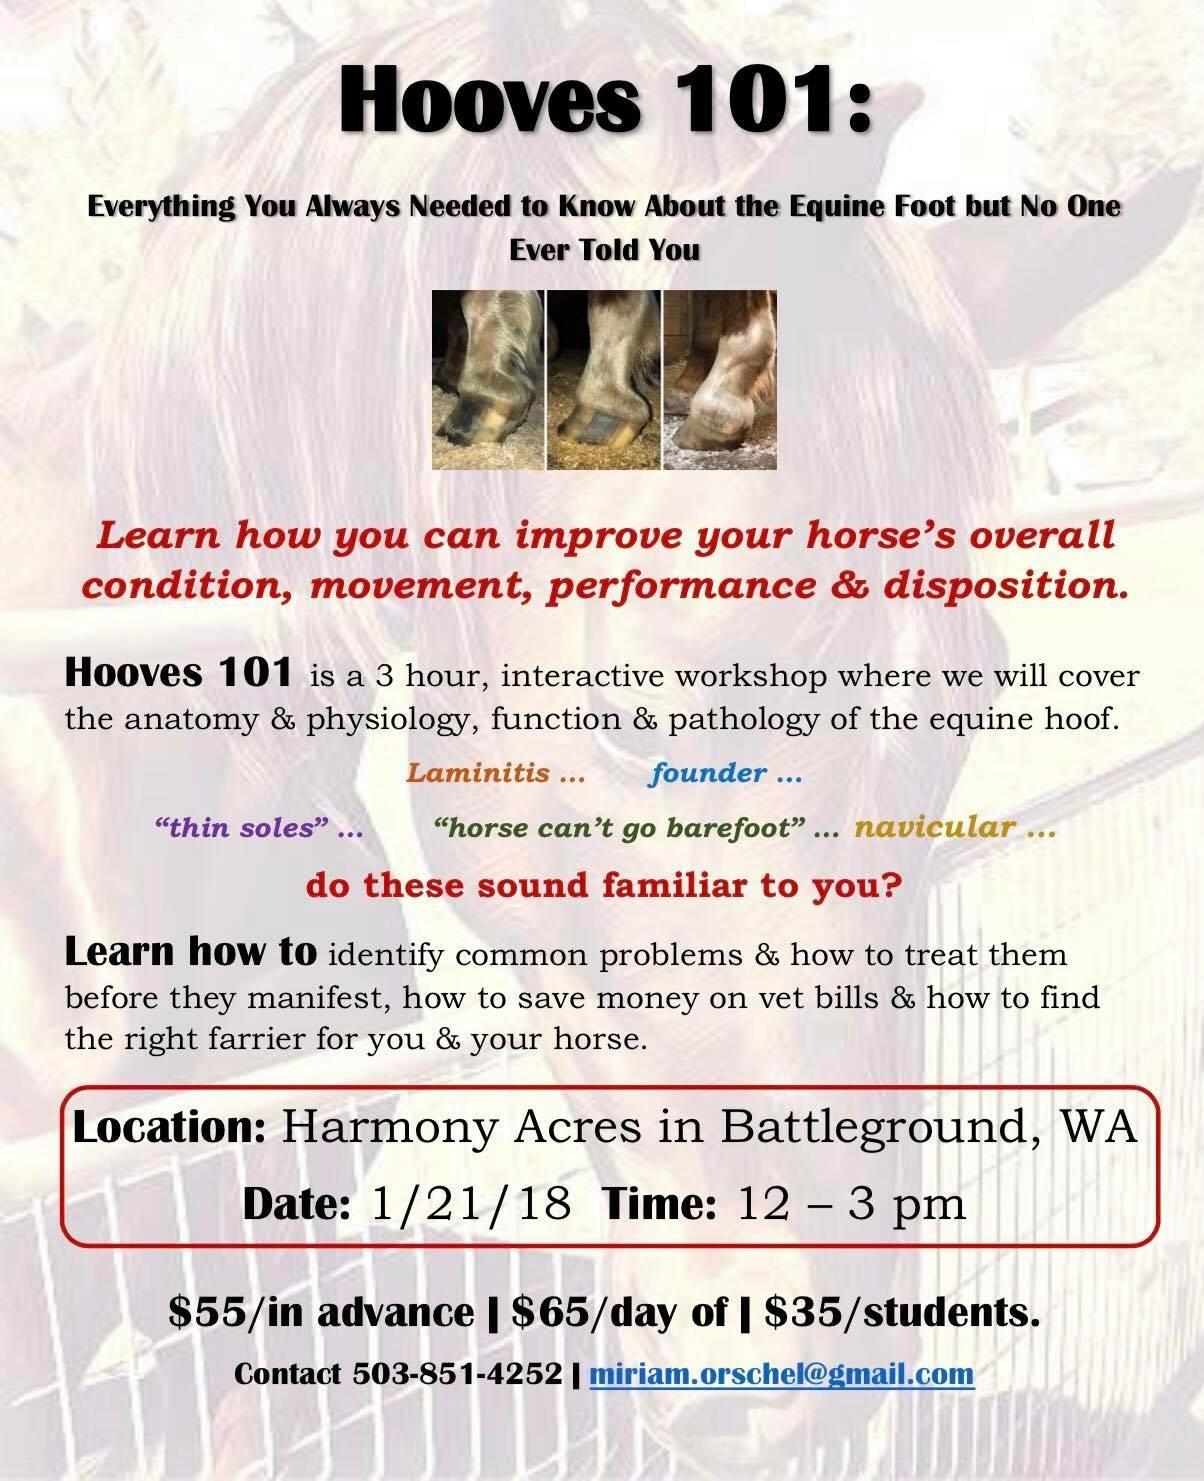 News Release: Hooves 101 - Oregon Horse Country/Oregon Horse Council ...